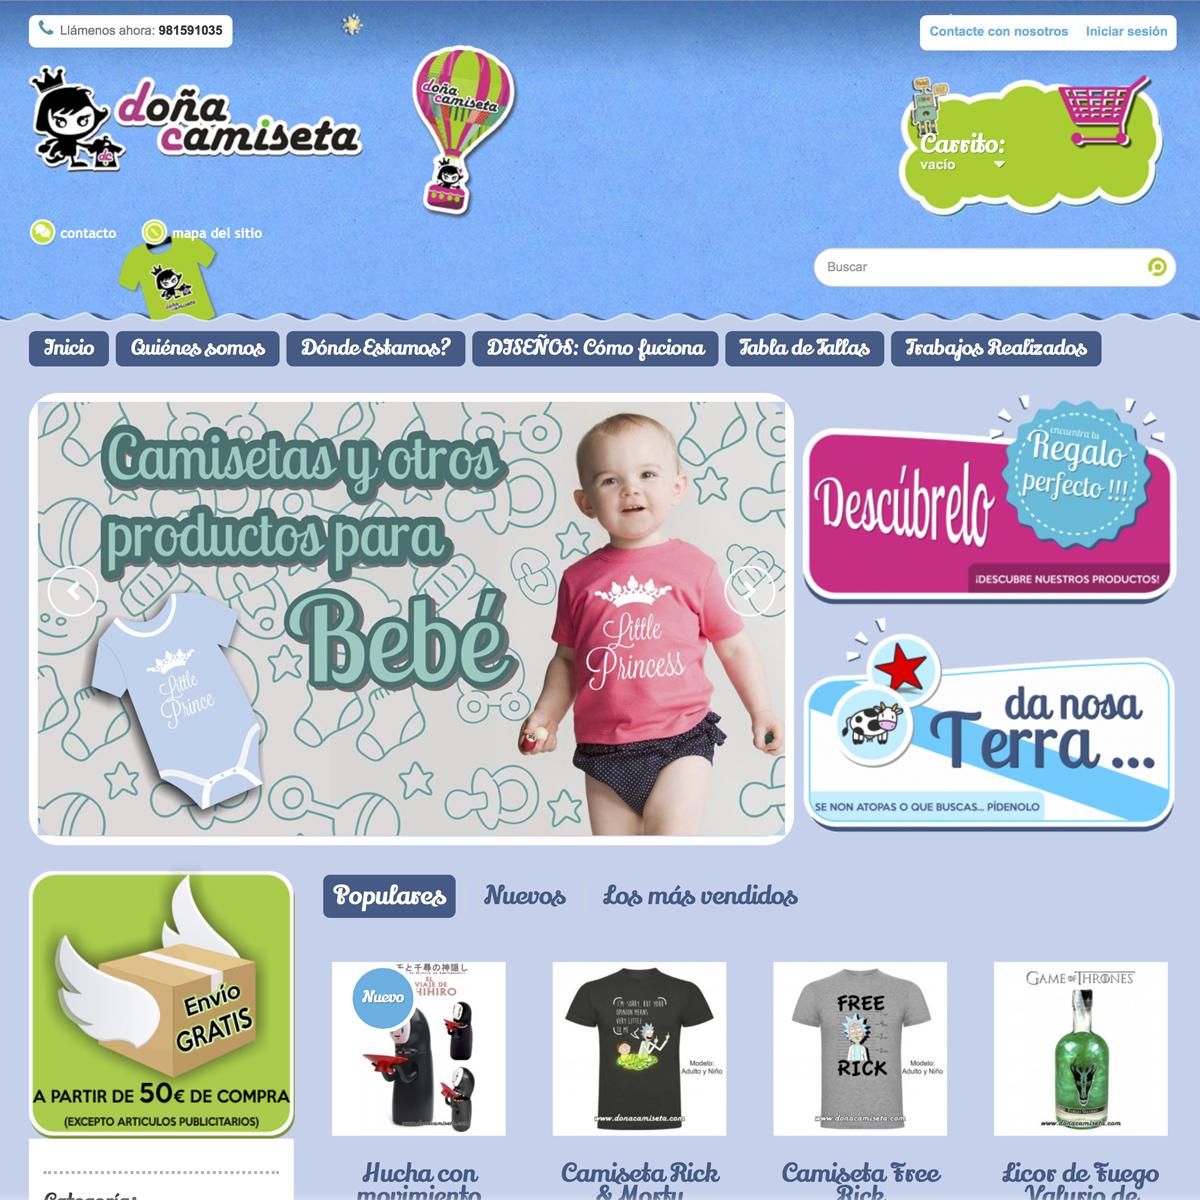 doña camiseta web